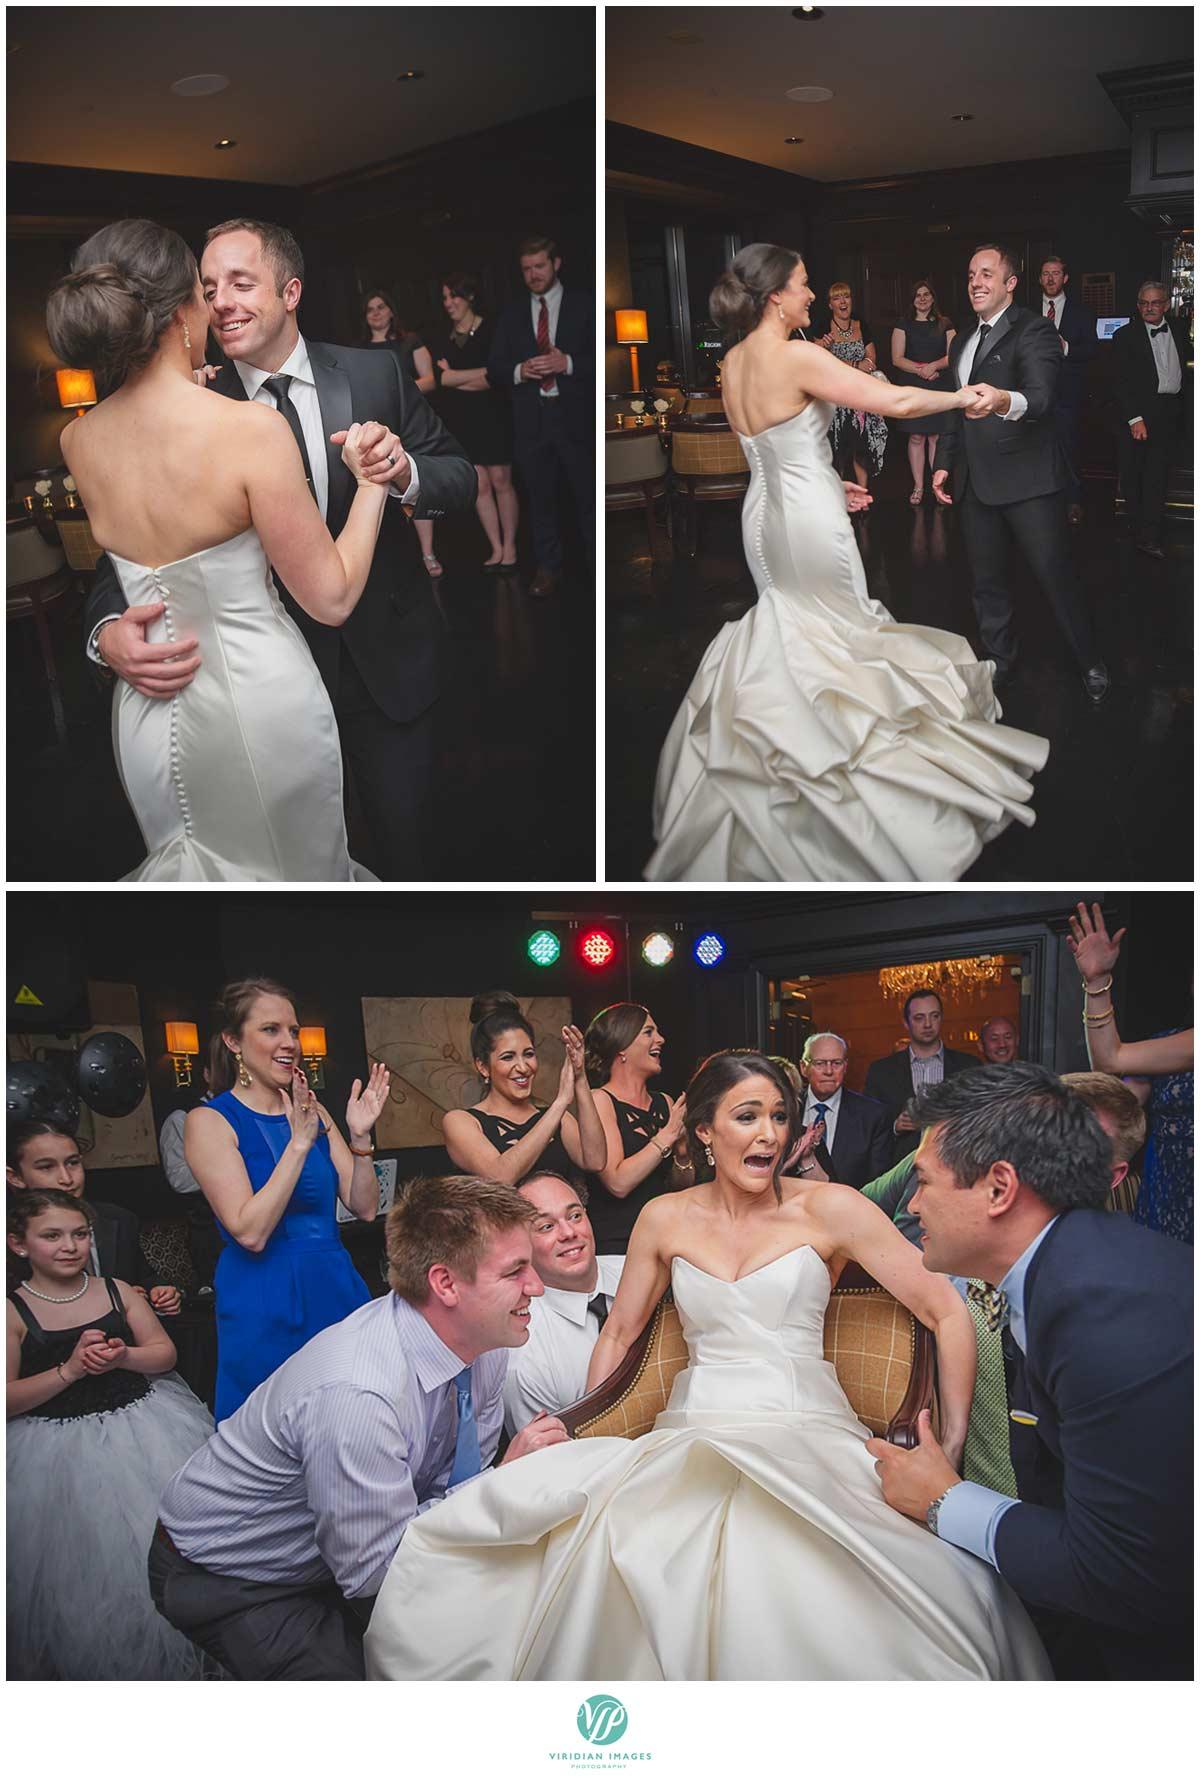 Peachtree_Club_Atlanta_Wedding_Viridian_Images_Photography-34